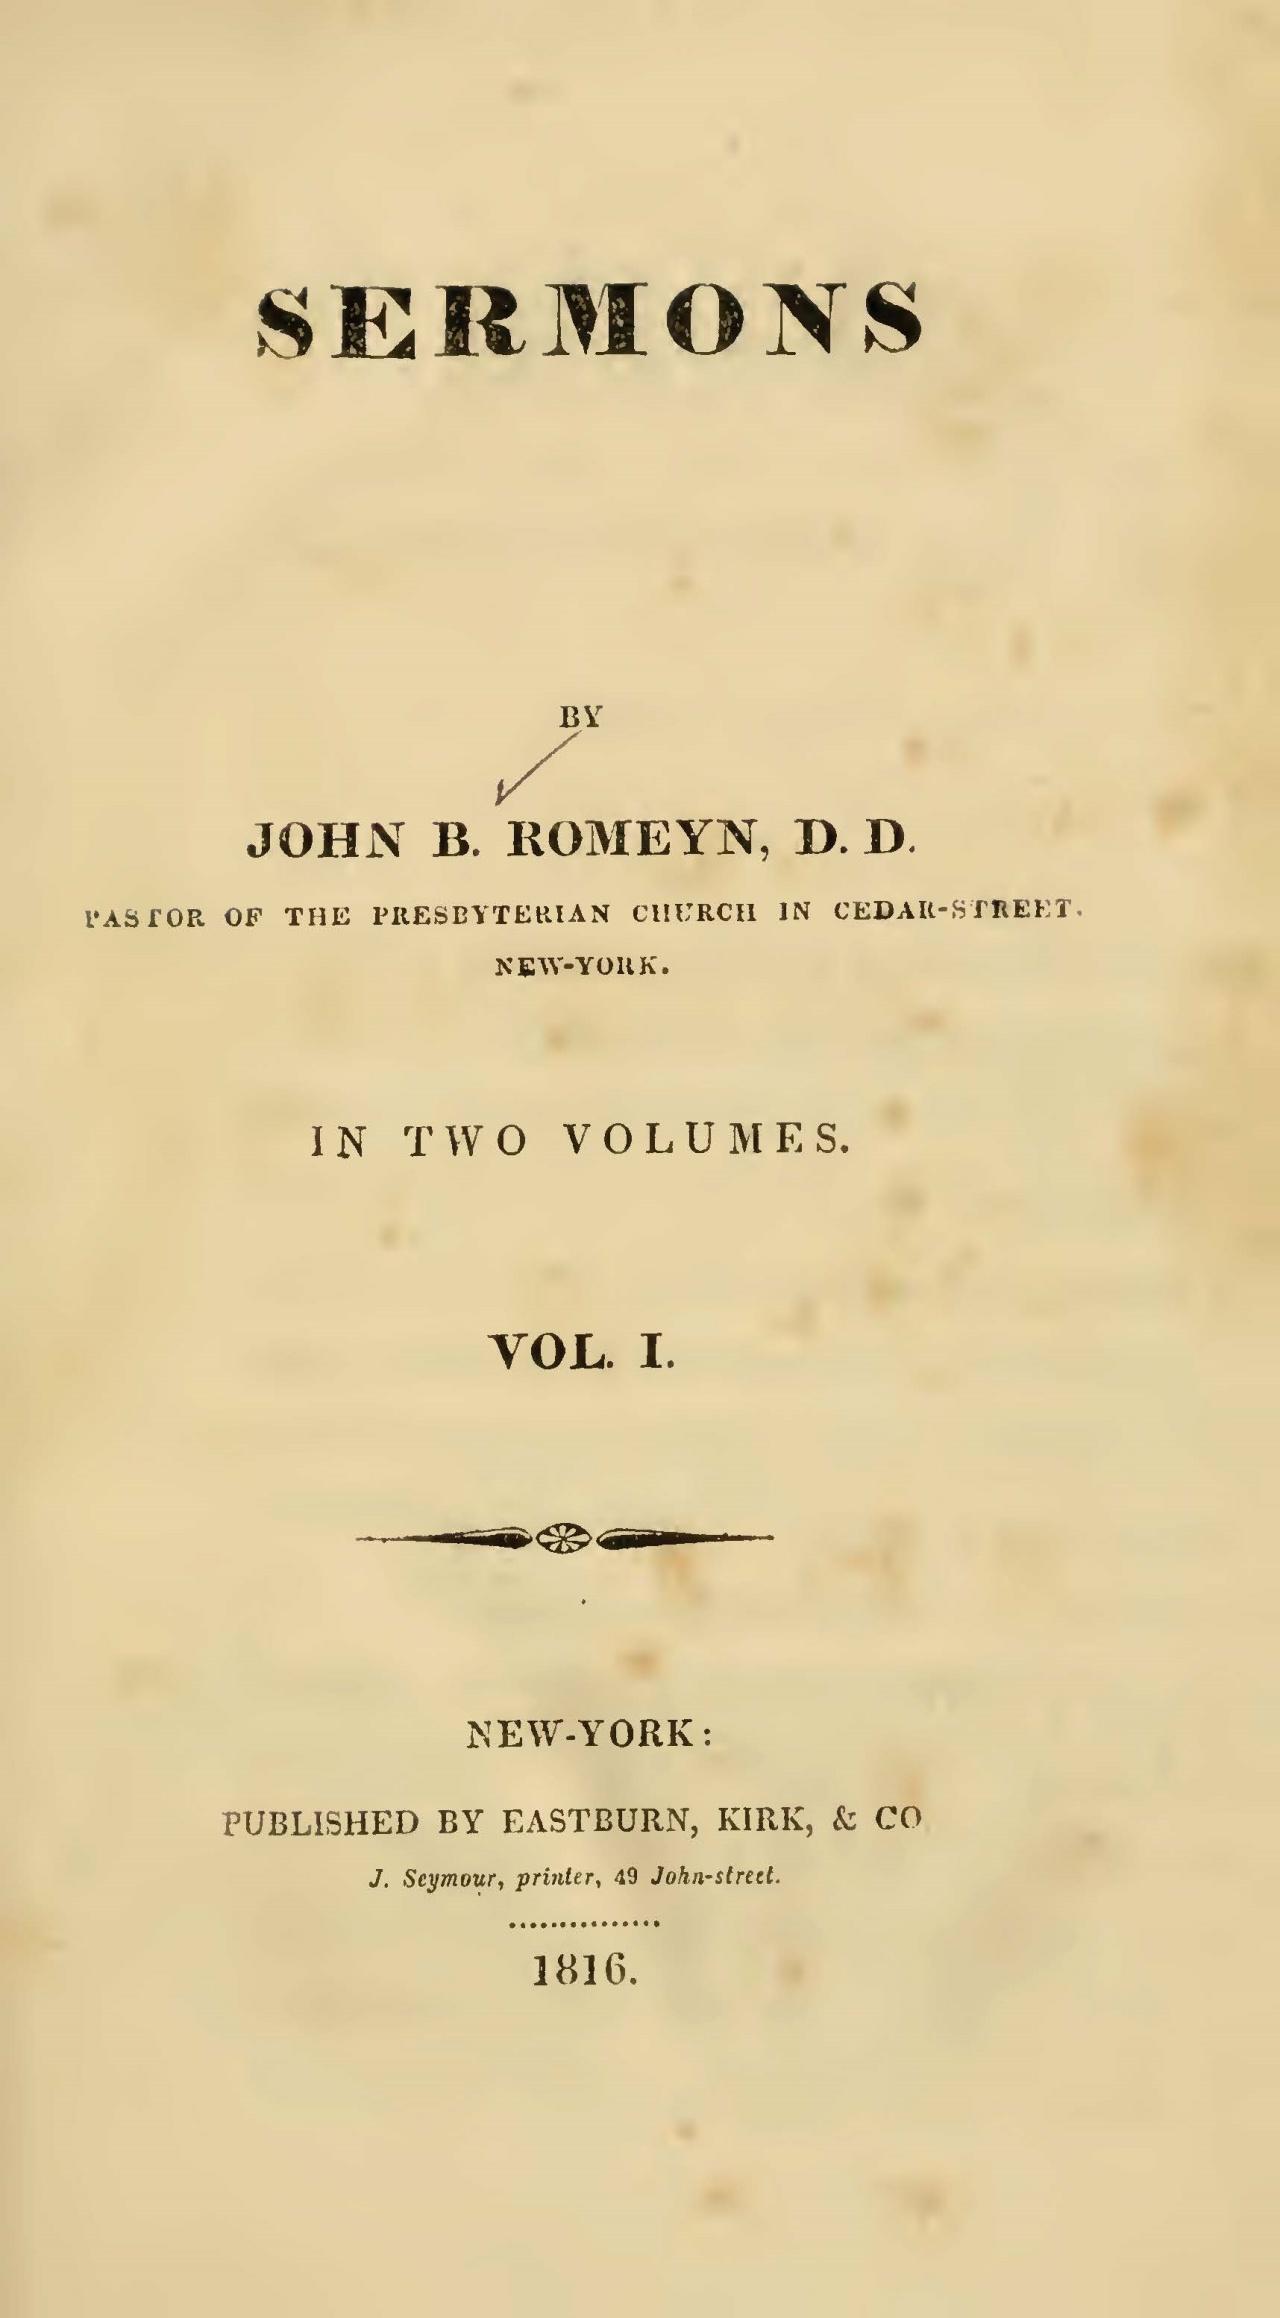 Romeyn, John Brodhead, Sermons, Vol. 1 Title Page.jpg